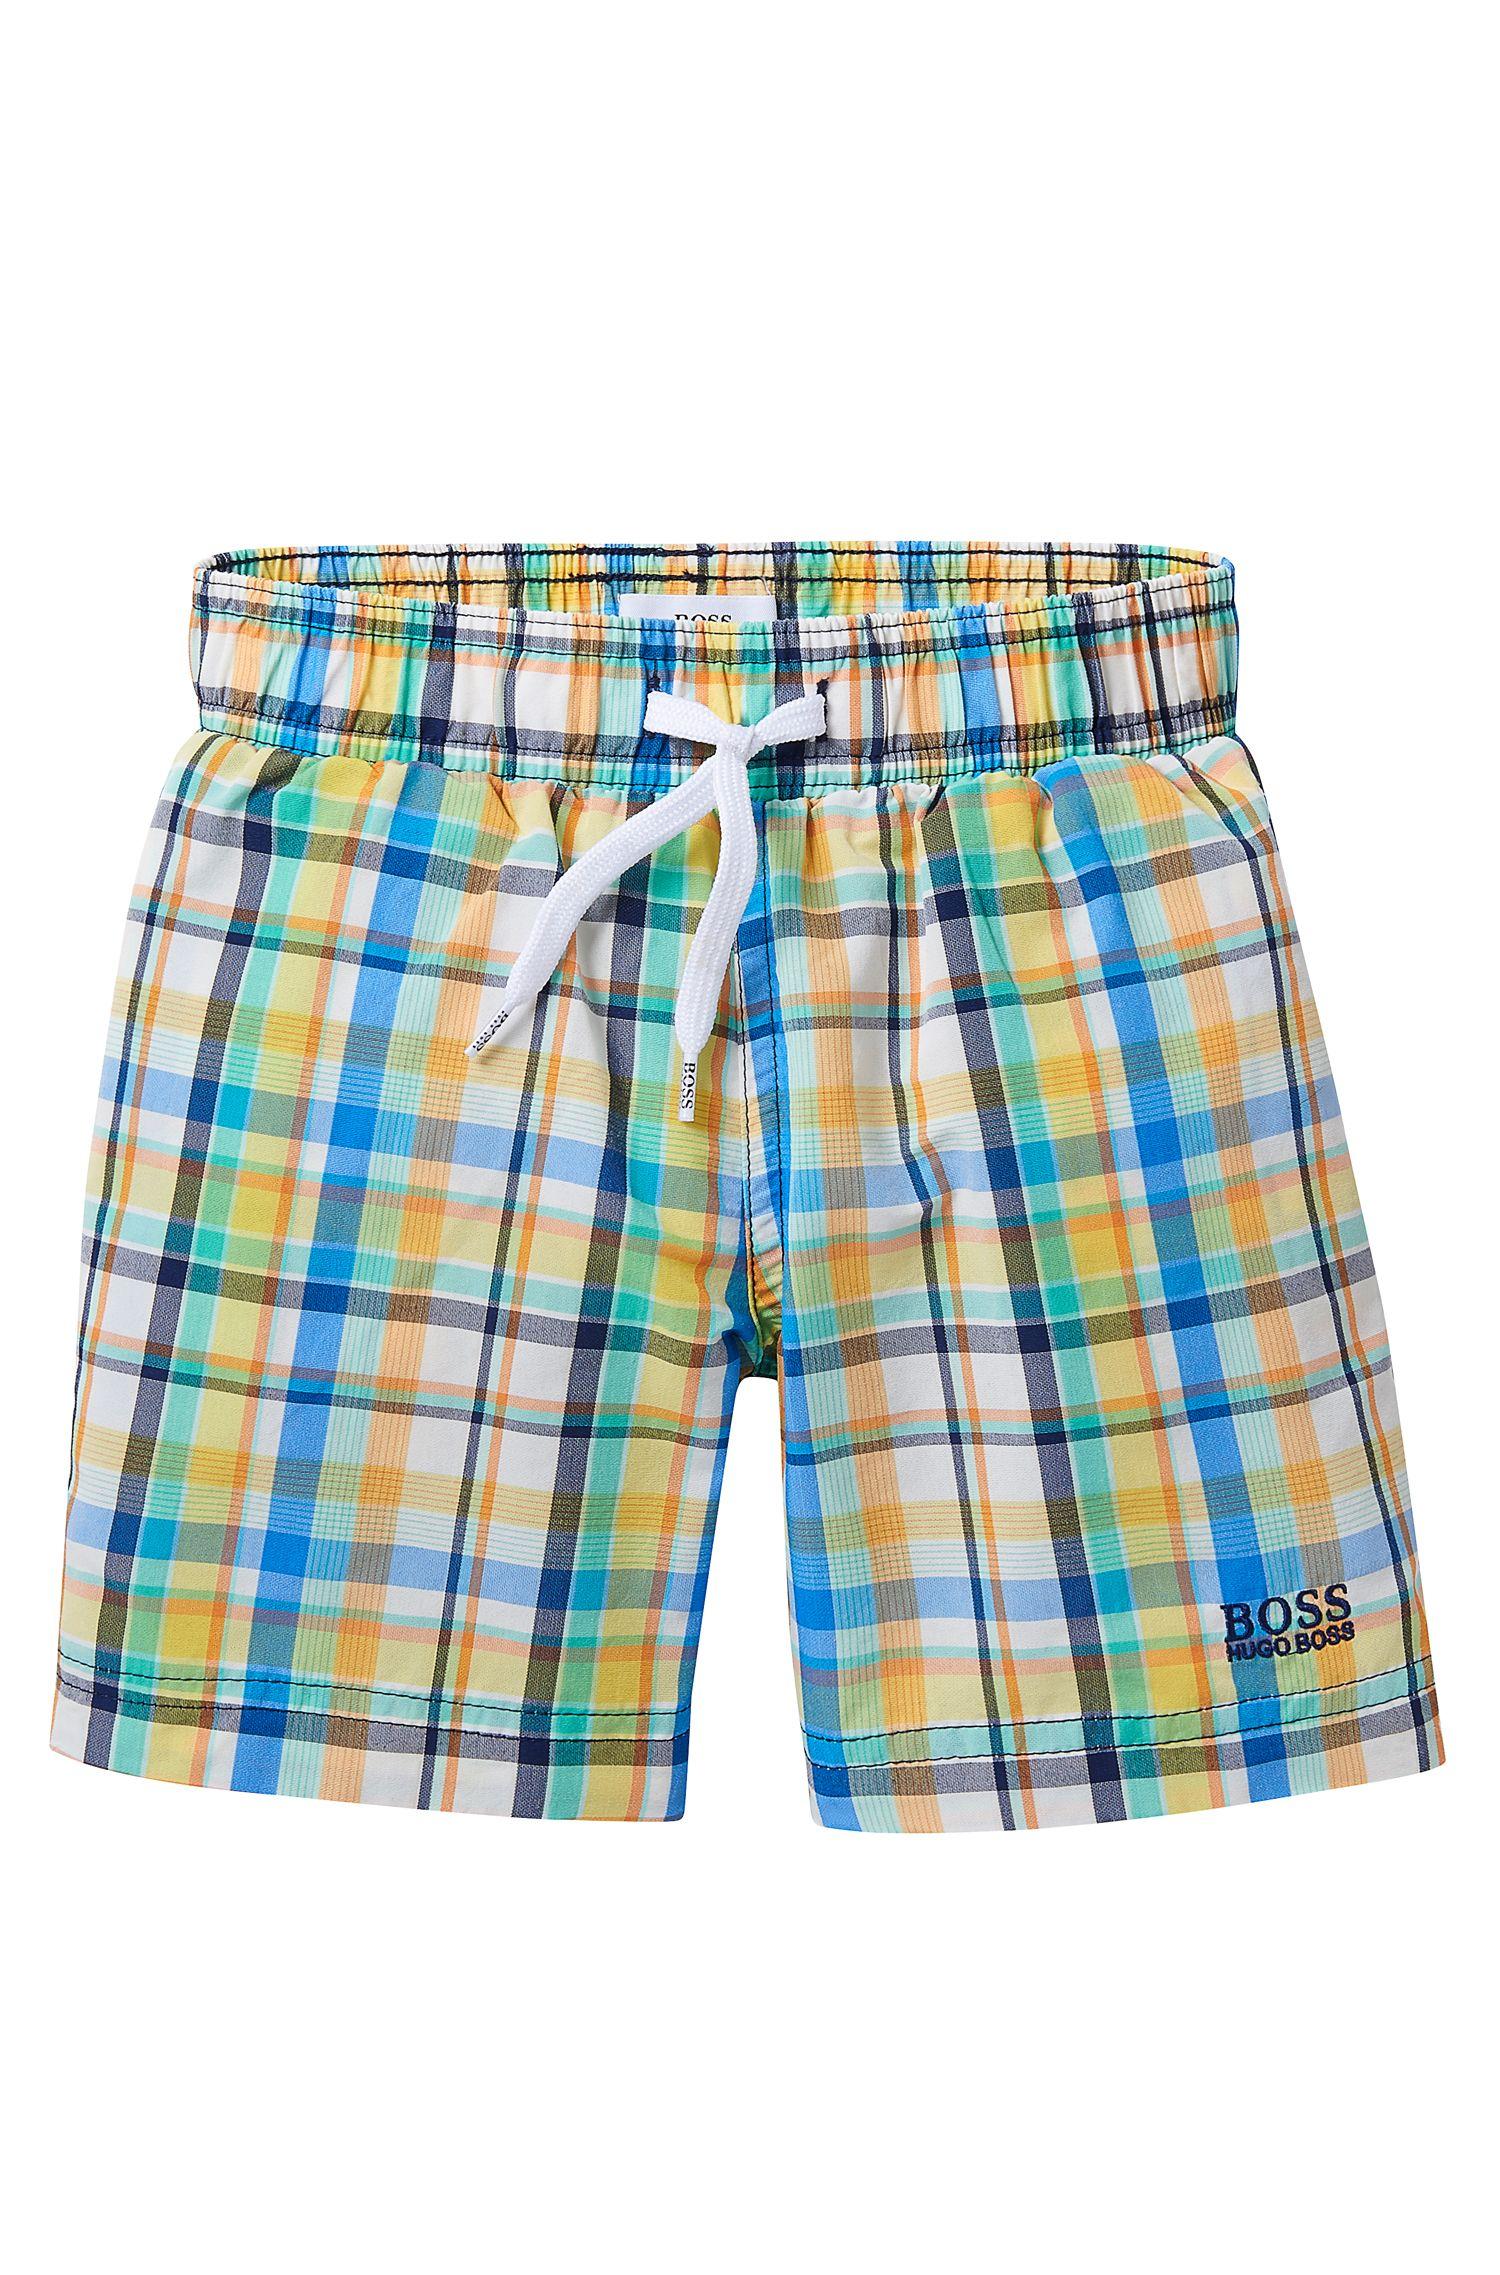 'J24405' | Boys Stretch Cotton Quick Dry Swim Trunks